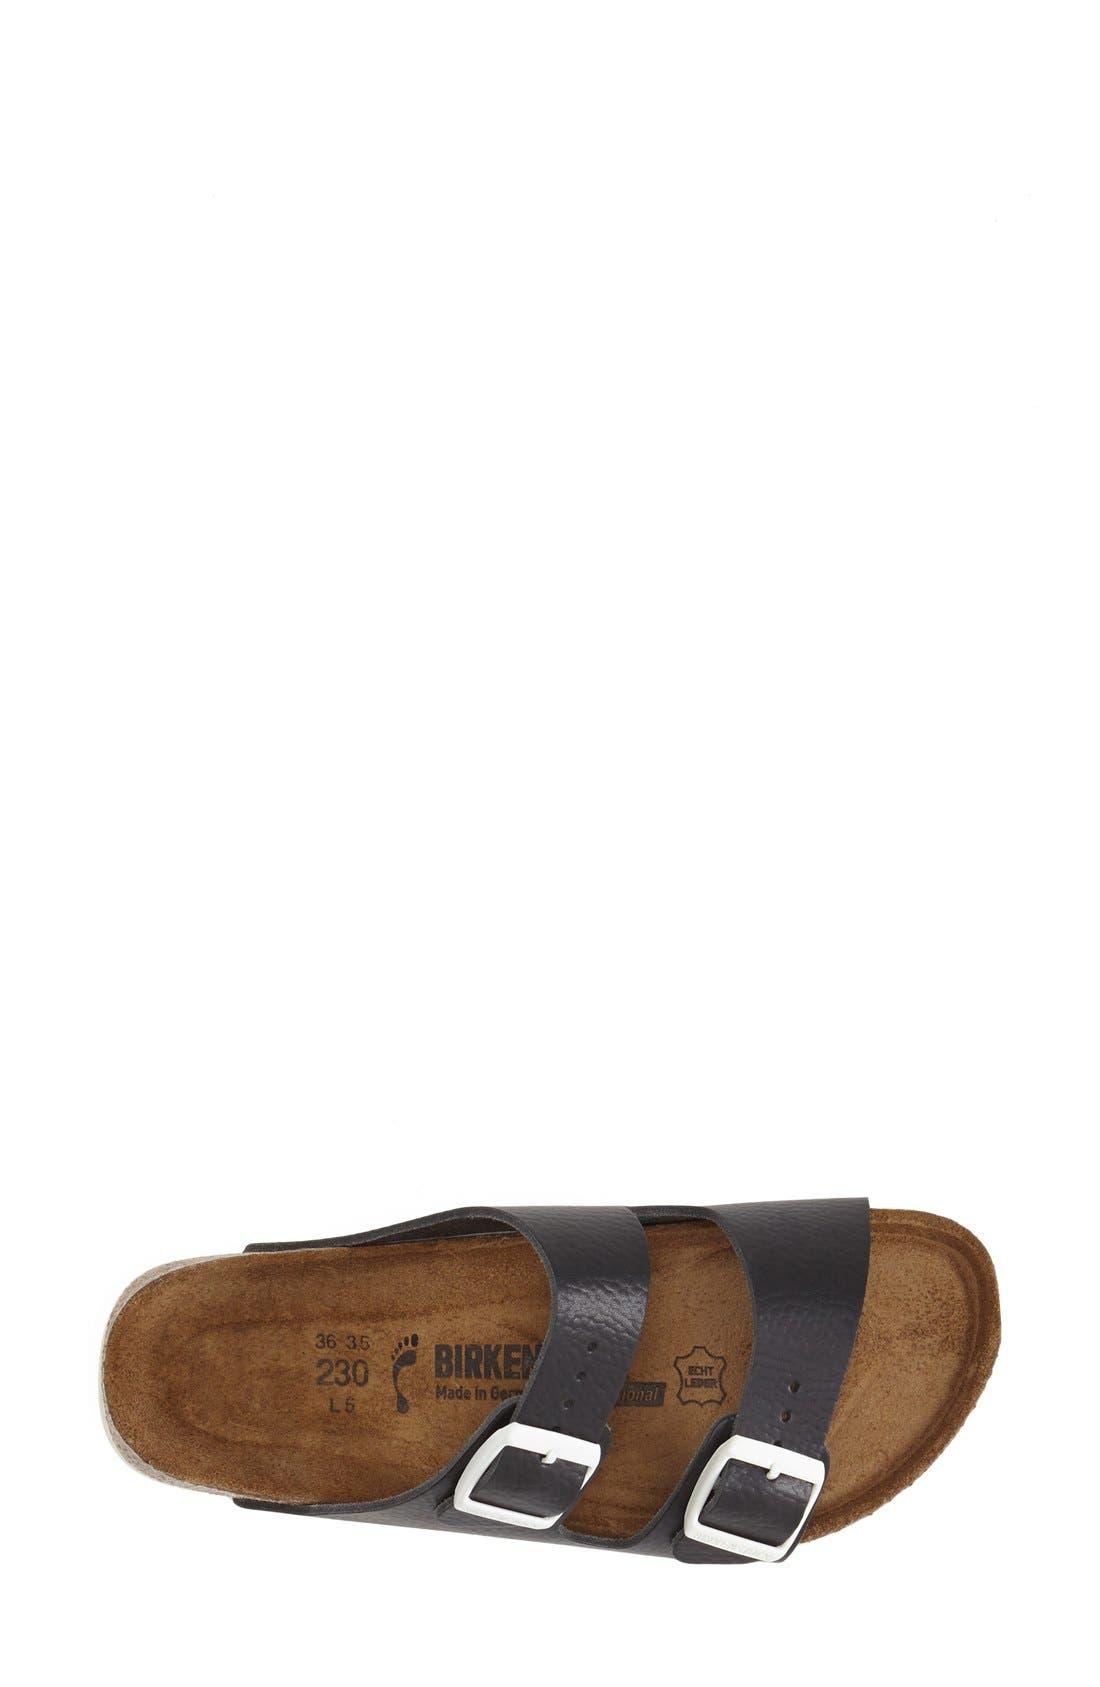 BIRKENSTOCK,                             'Arizona' Leather Double Band Footbed Sandal,                             Alternate thumbnail 4, color,                             001